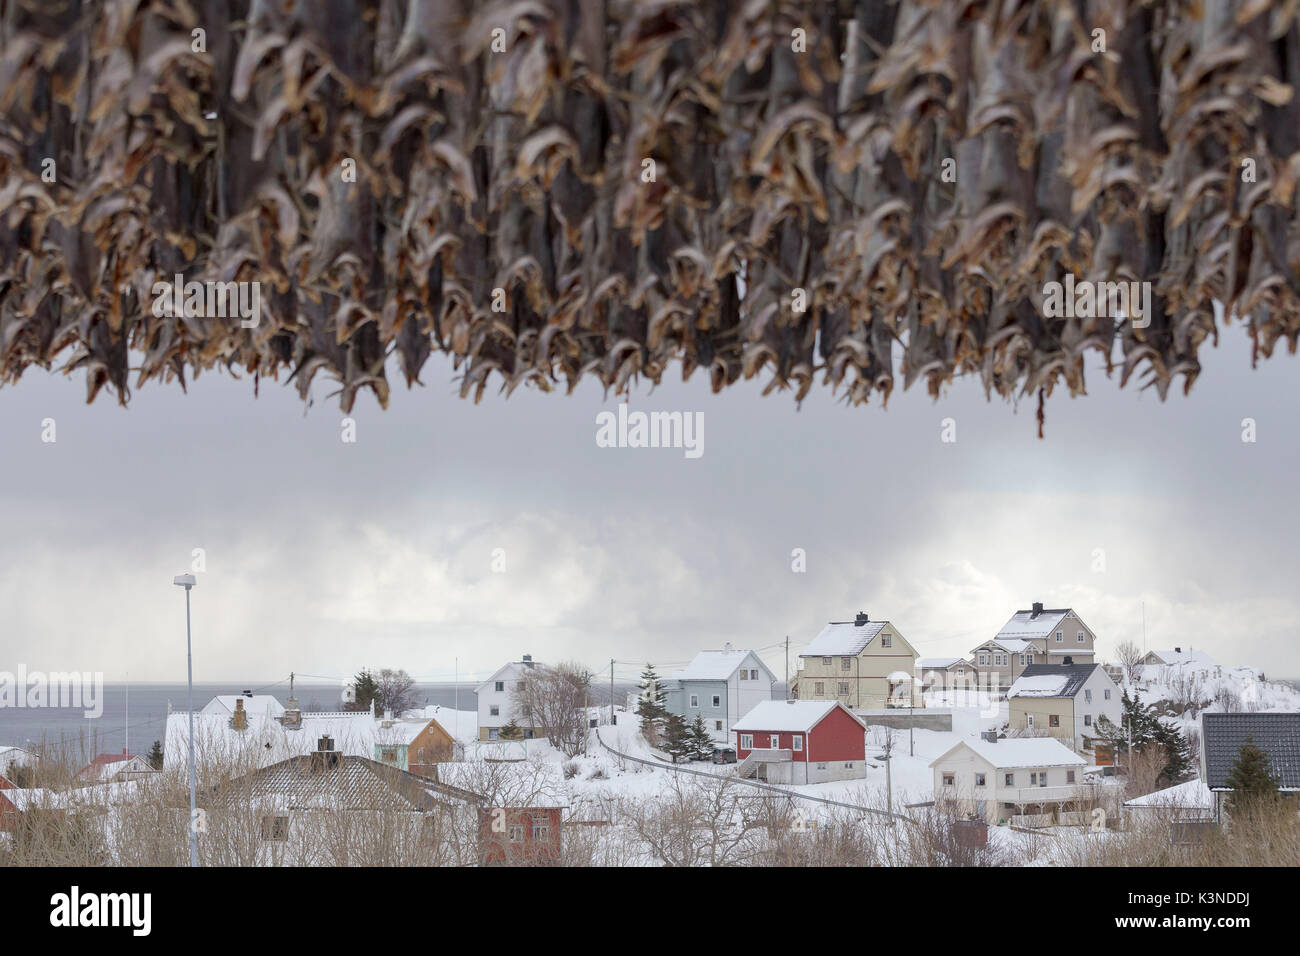 Skandinavische Häuser im Schnee gegen die bedeckt Meer im Lofoten Inseln, Norwegen Stockbild